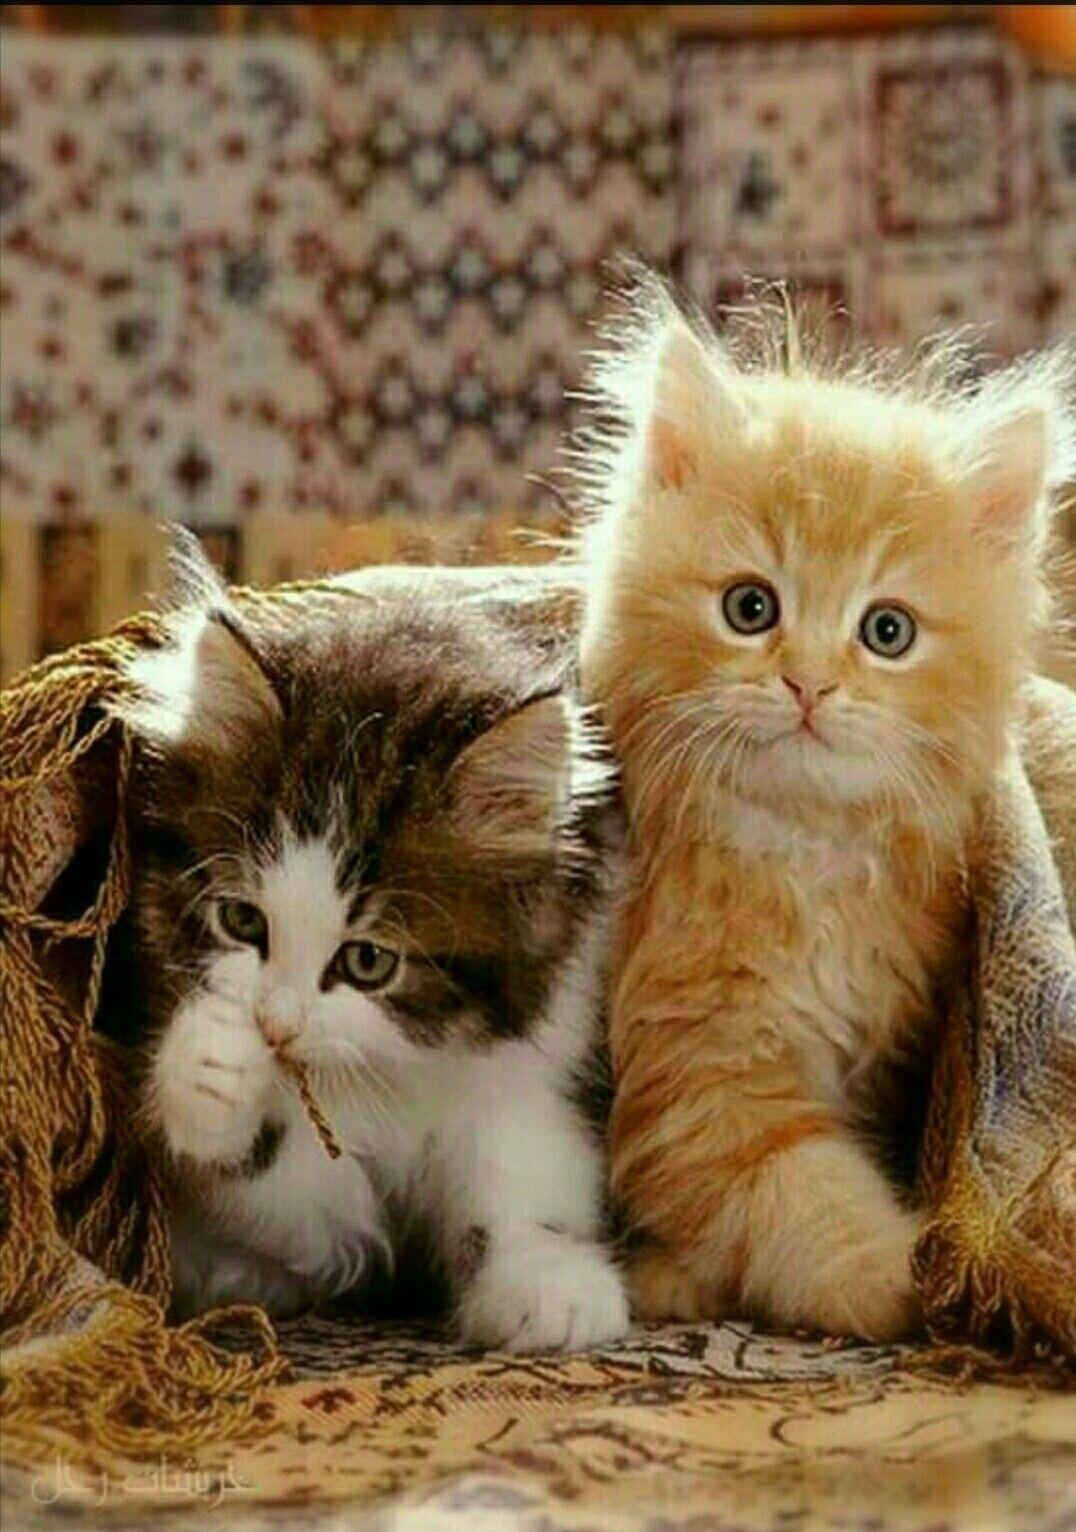 Pin by Sirpa Vidman on Cute cats Koira, Hassut kissat, Kissa